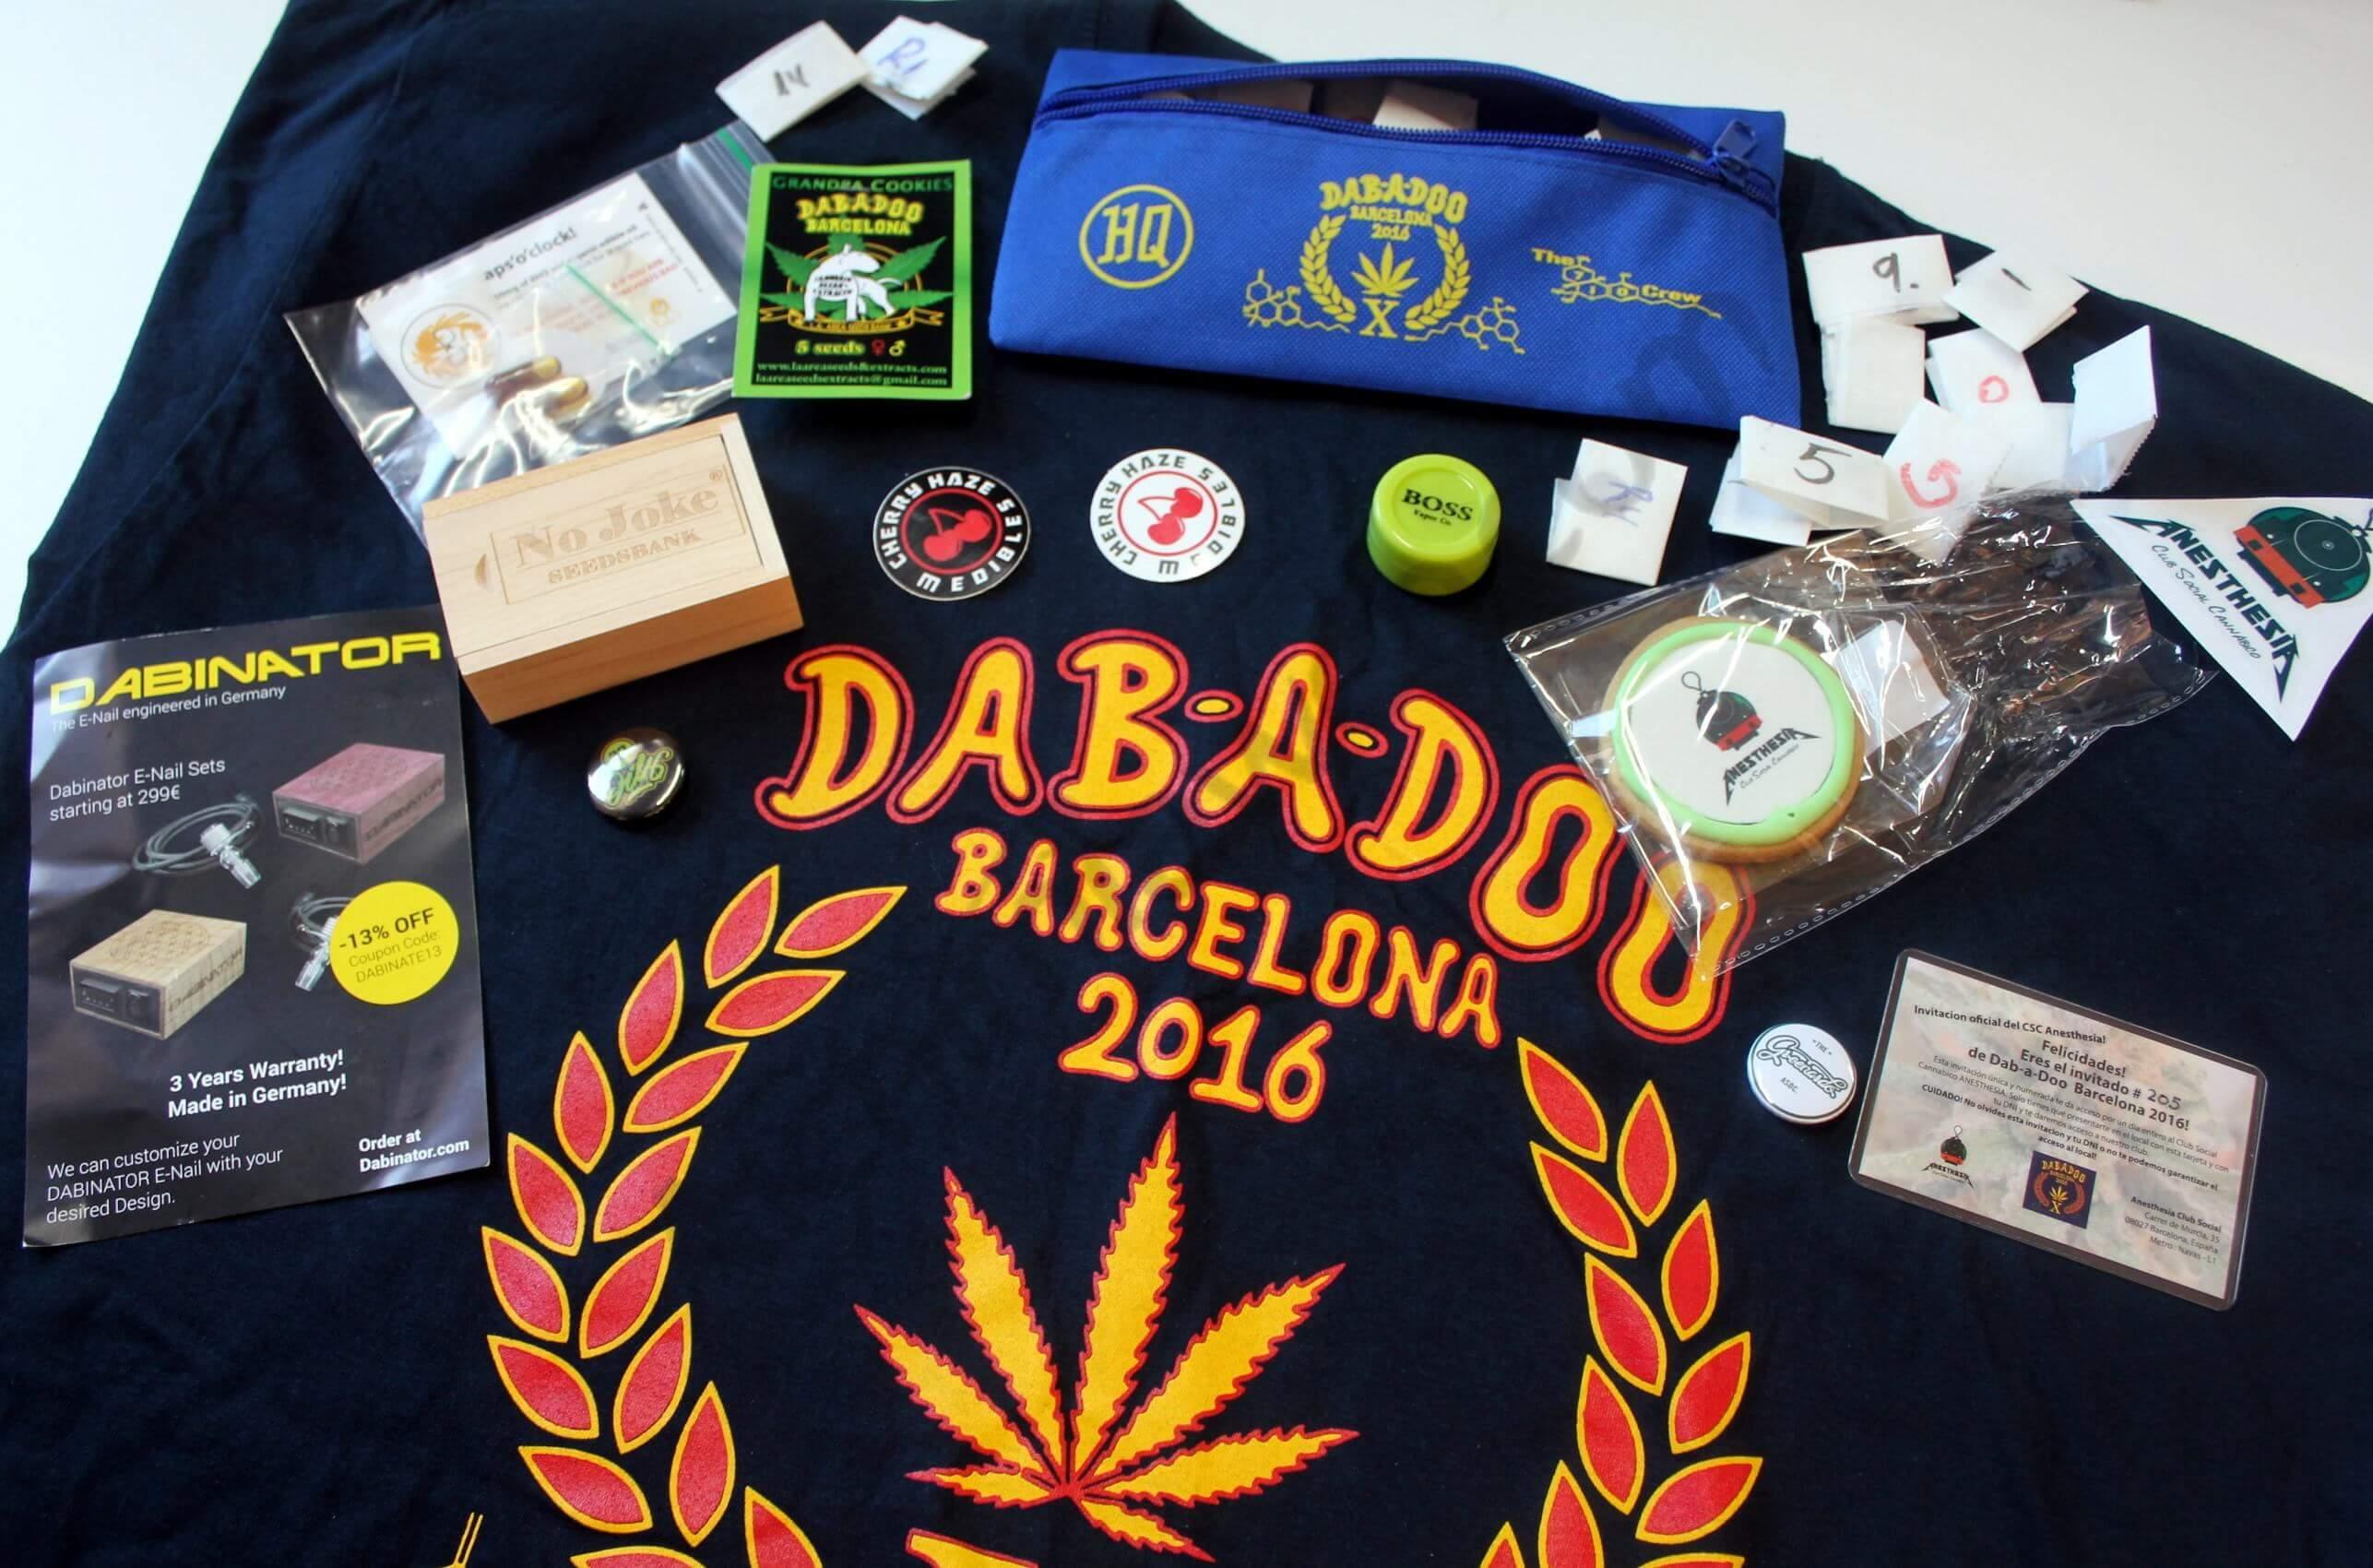 Dab-a-Doo Barcelone 2016